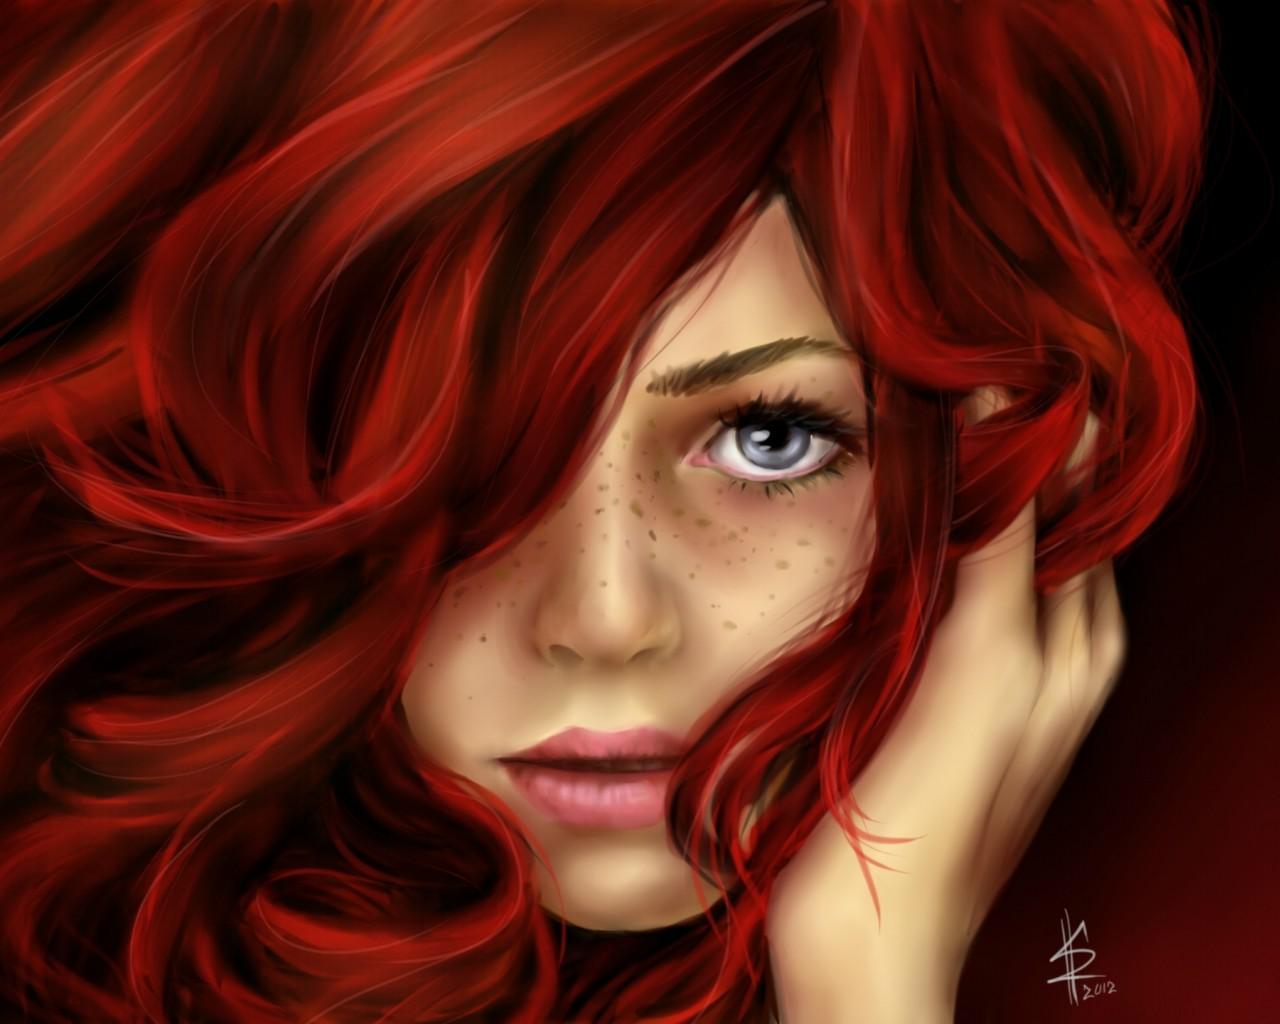 1280x1024 Beautiful Red Hair Girl Drawing